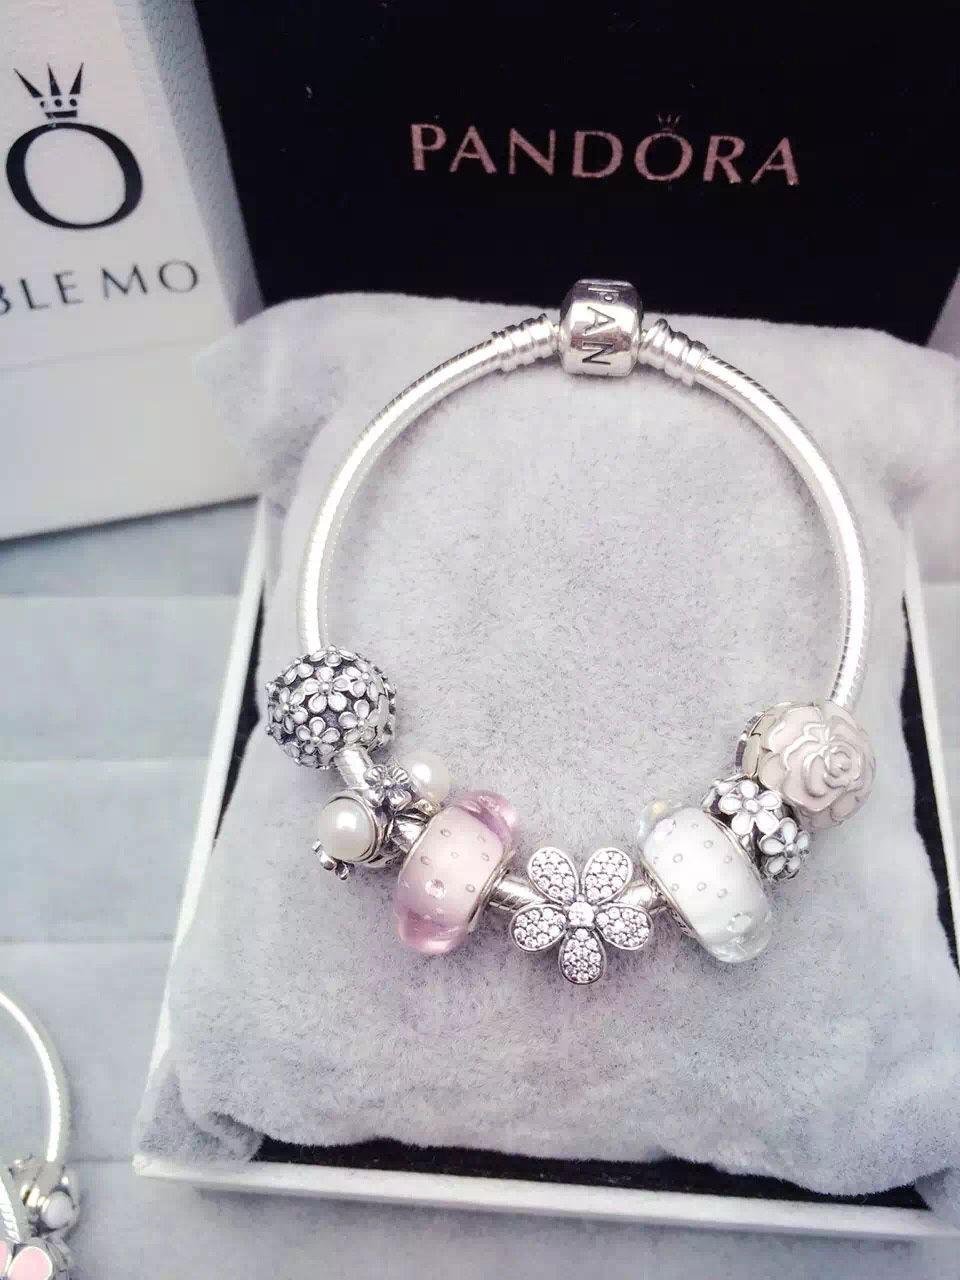 199 pandora charm bracelet white pink hot sale